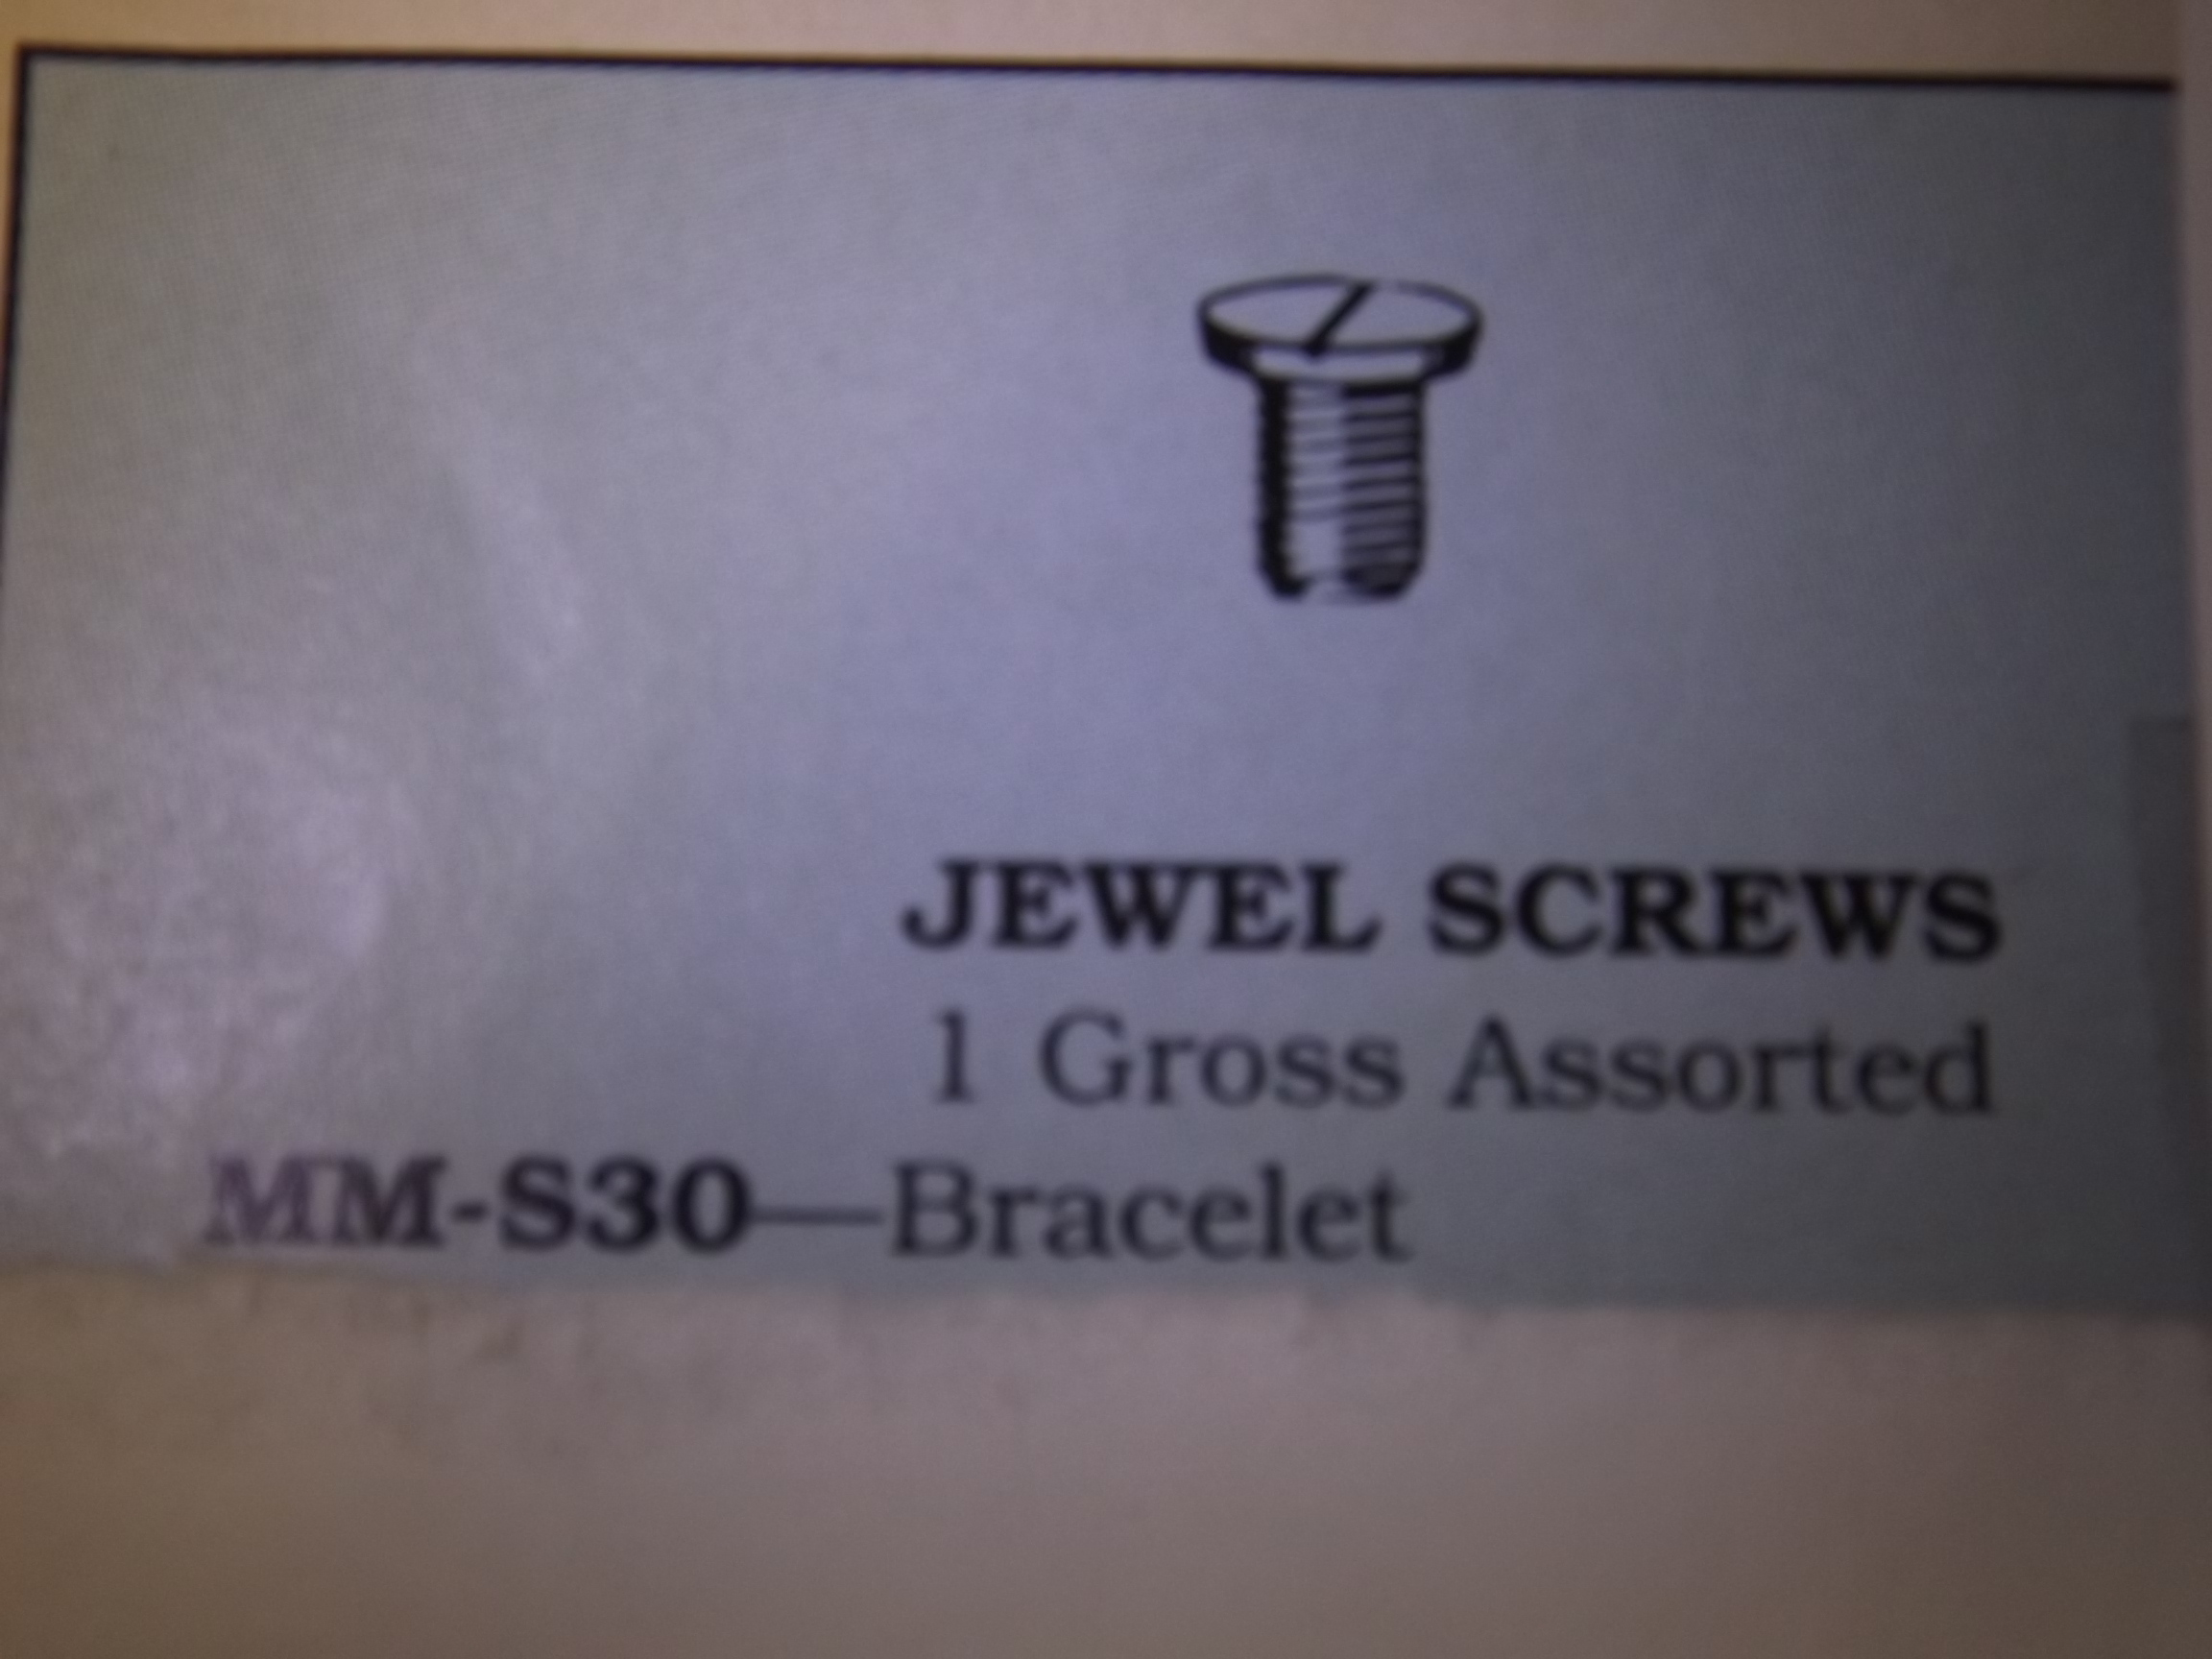 MM-S30 Jewel Screws, Bracelet- One Gross- Vigor - Two Only!